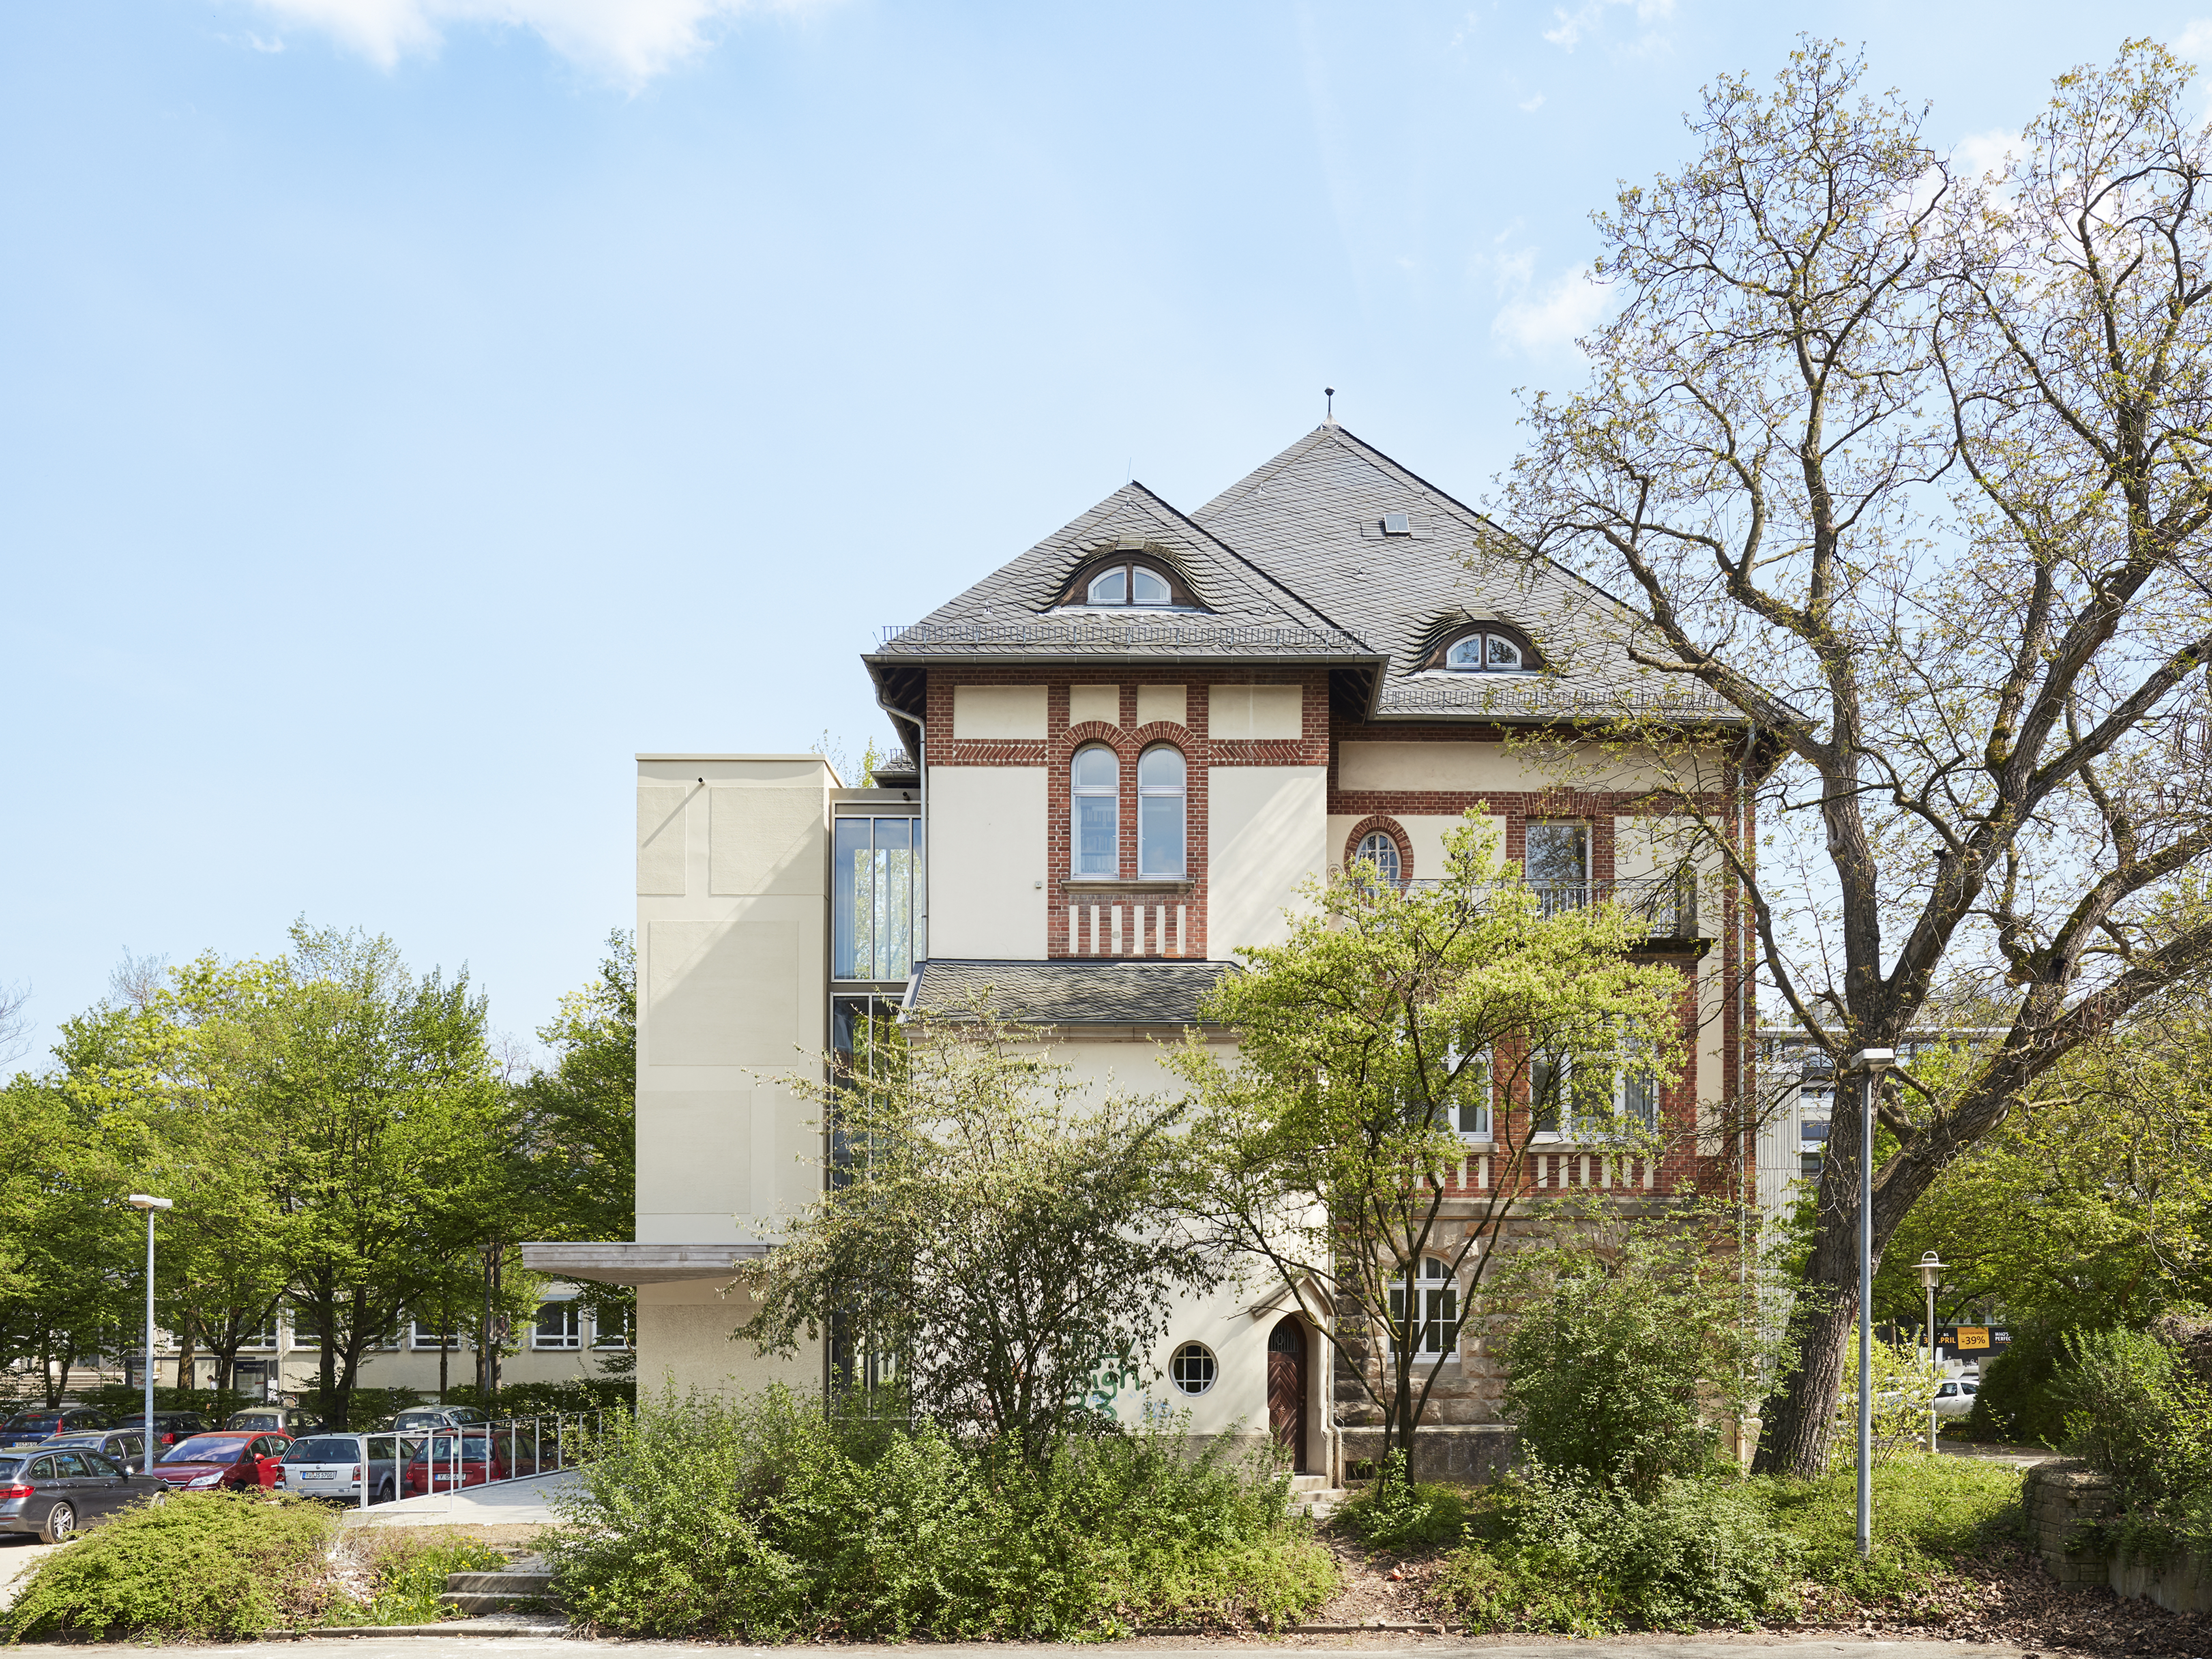 Umbau denkmalgeschützter Direktorenvilla zur neuen ›School of Education‹ (10)